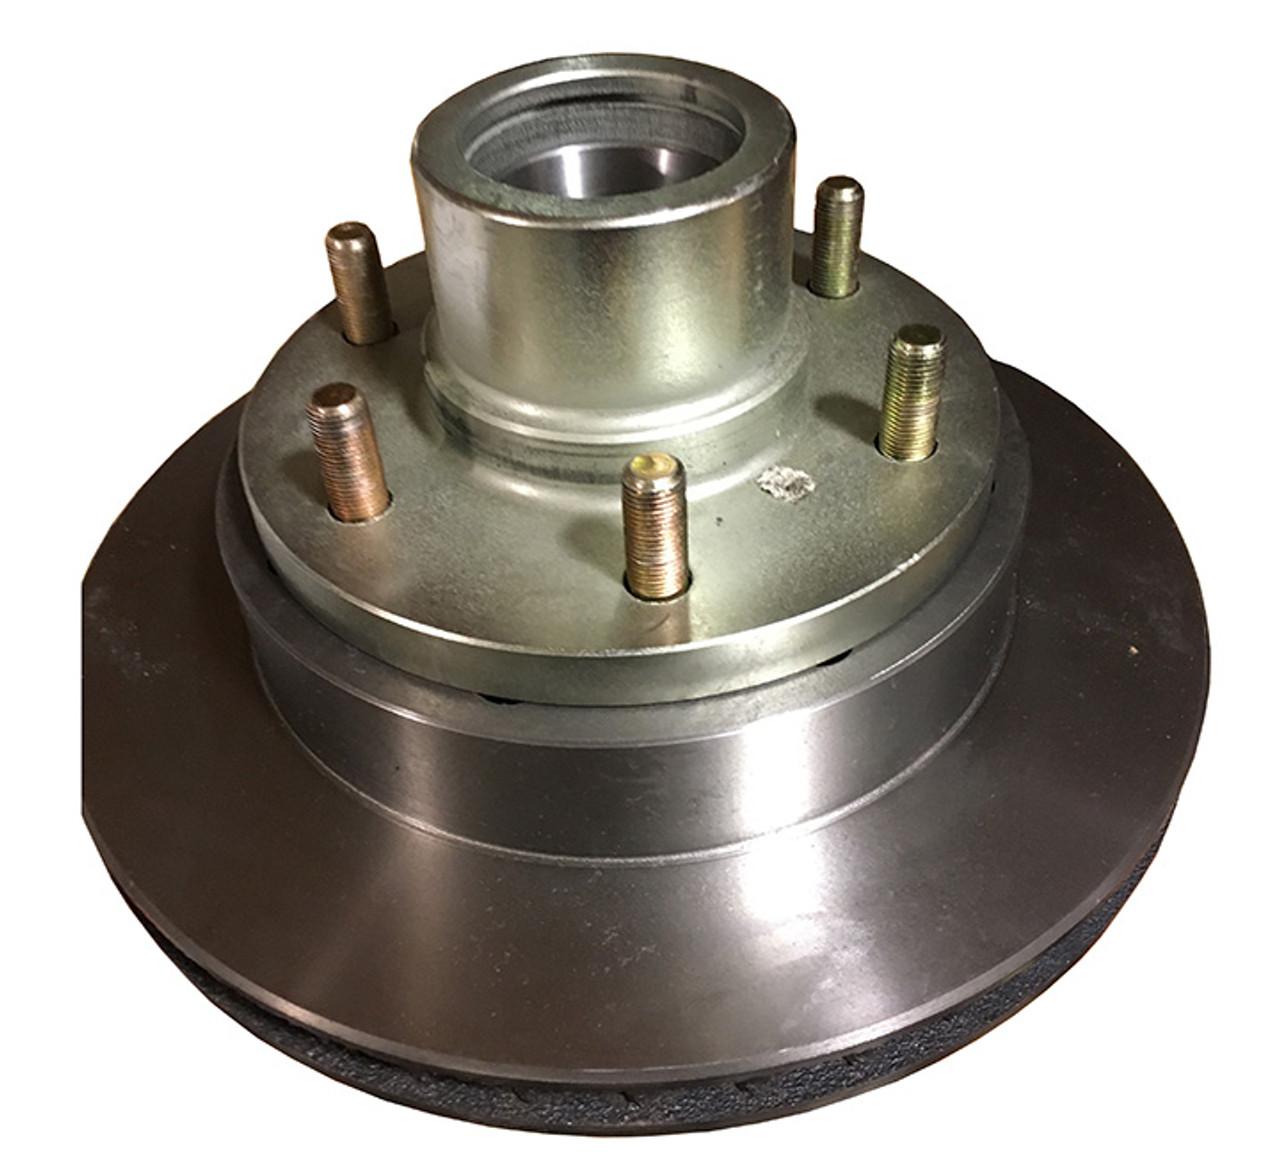 8-450-03 --- UFP by Dexter Hub/Rotor for 5.2k - Zinc - DB42